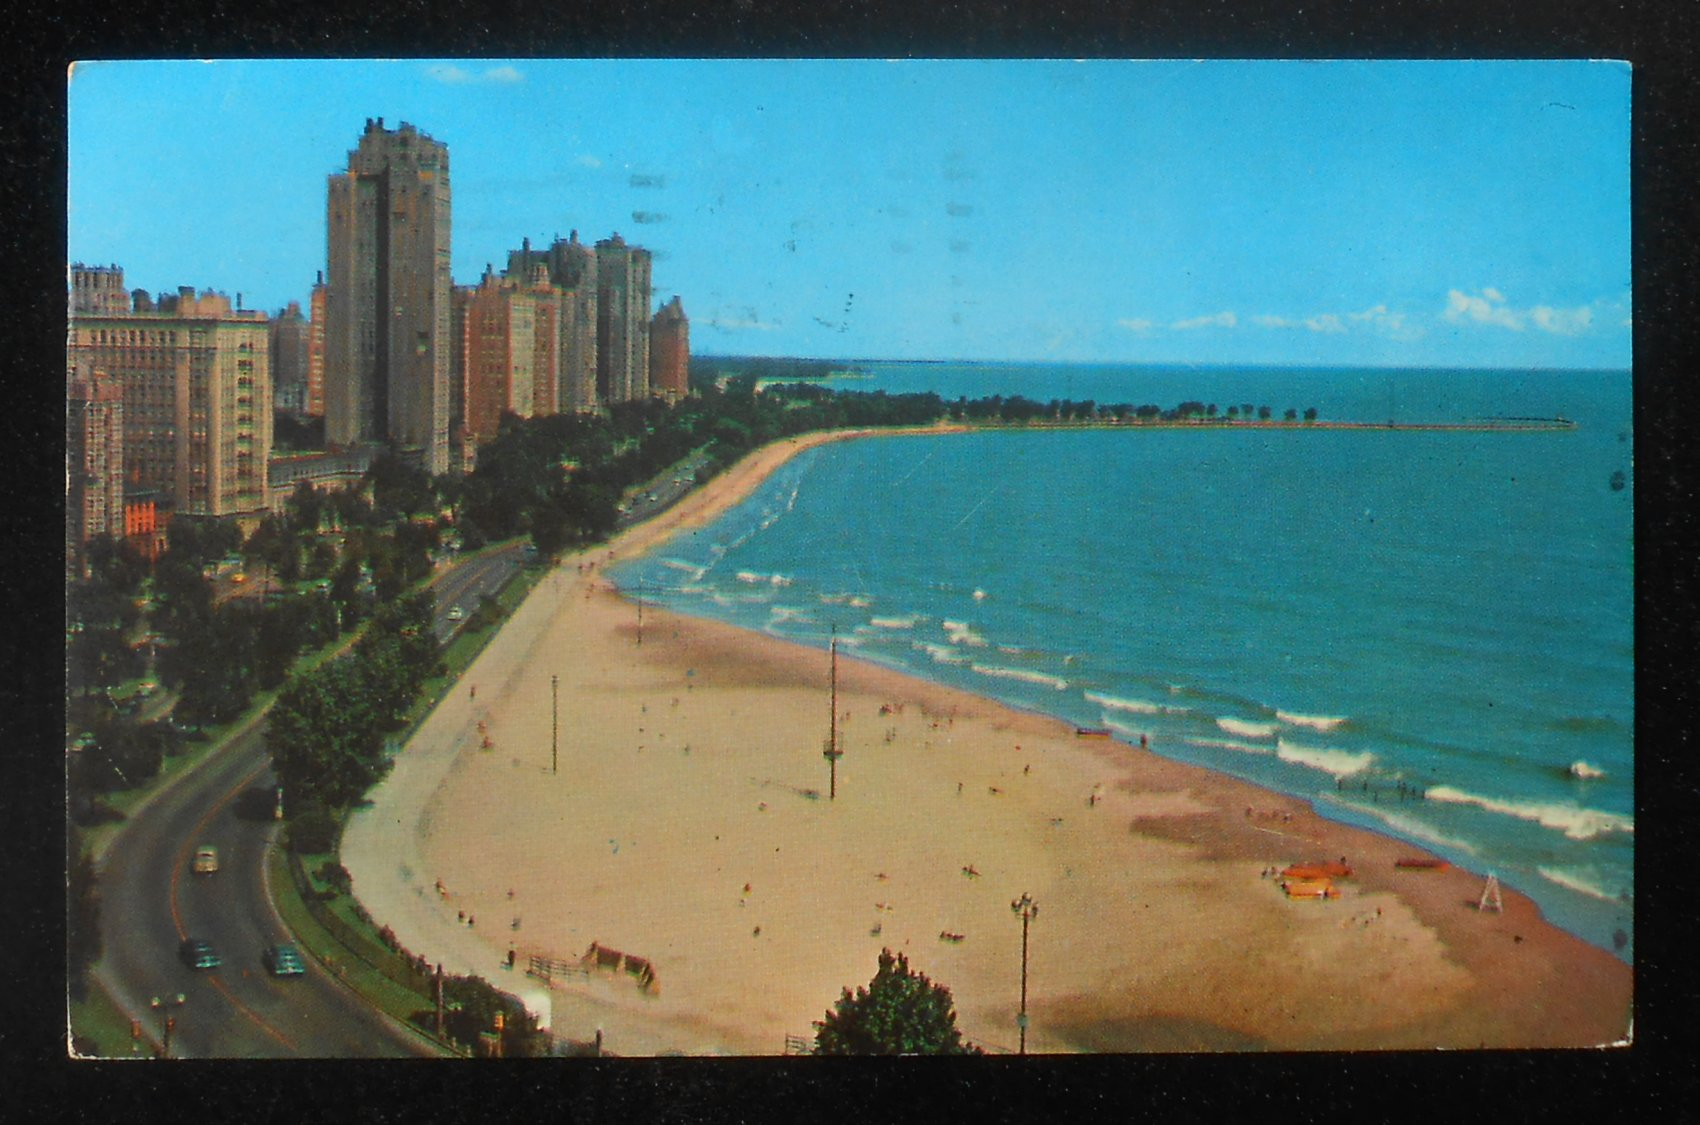 1961 gold coast beach apartment buildings chicago il pc ebay. Black Bedroom Furniture Sets. Home Design Ideas